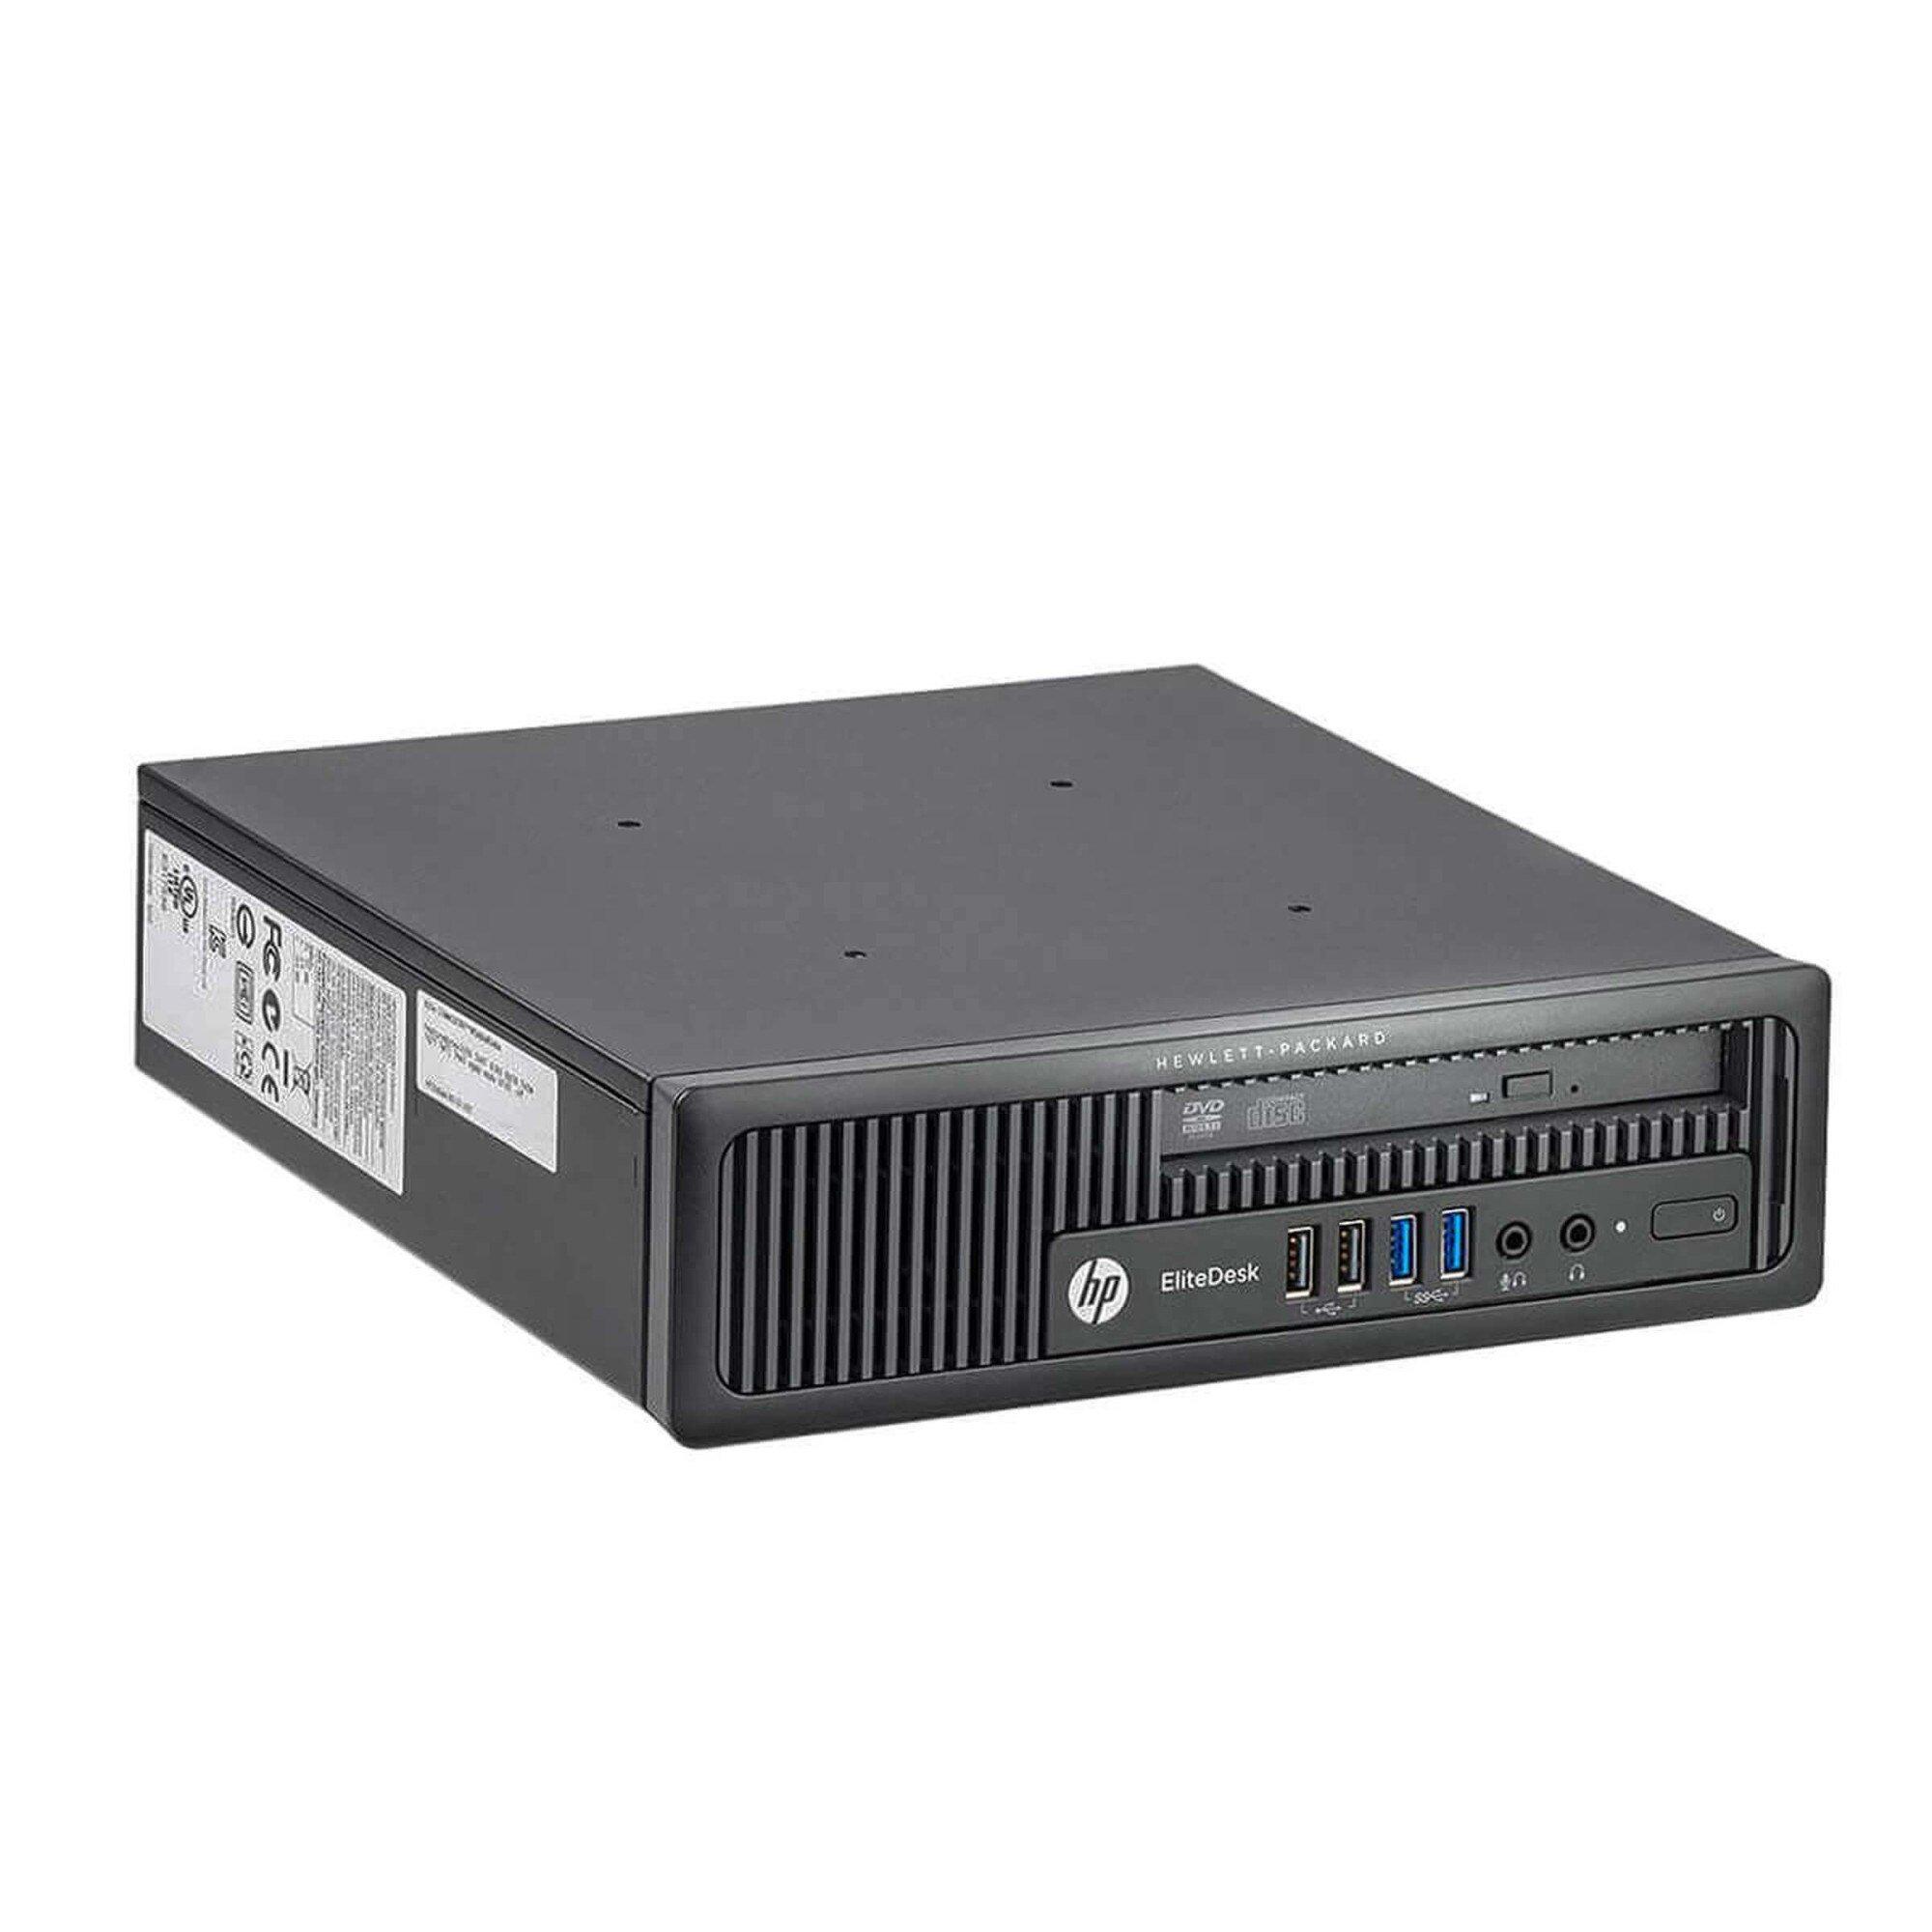 Calculator HP EliteDesk 800 G1, Desktop USDT, Intel Core i5 4570S 2.9 GHz, 8 GB DDR3; 250 GB SSD SATA; Windows 10 Home; 3 Ani Garantie, Refurbished - imaginea 1